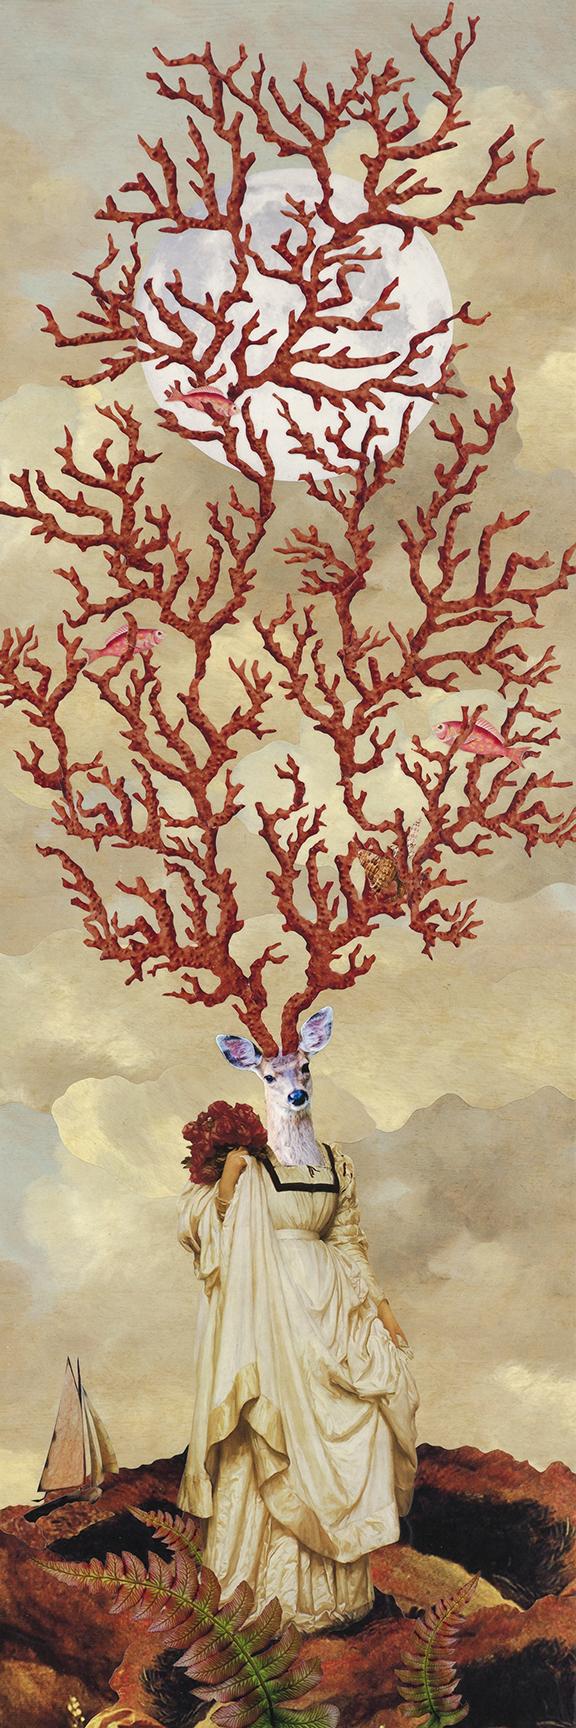 Dear Sea Deer —fine art print from original collage